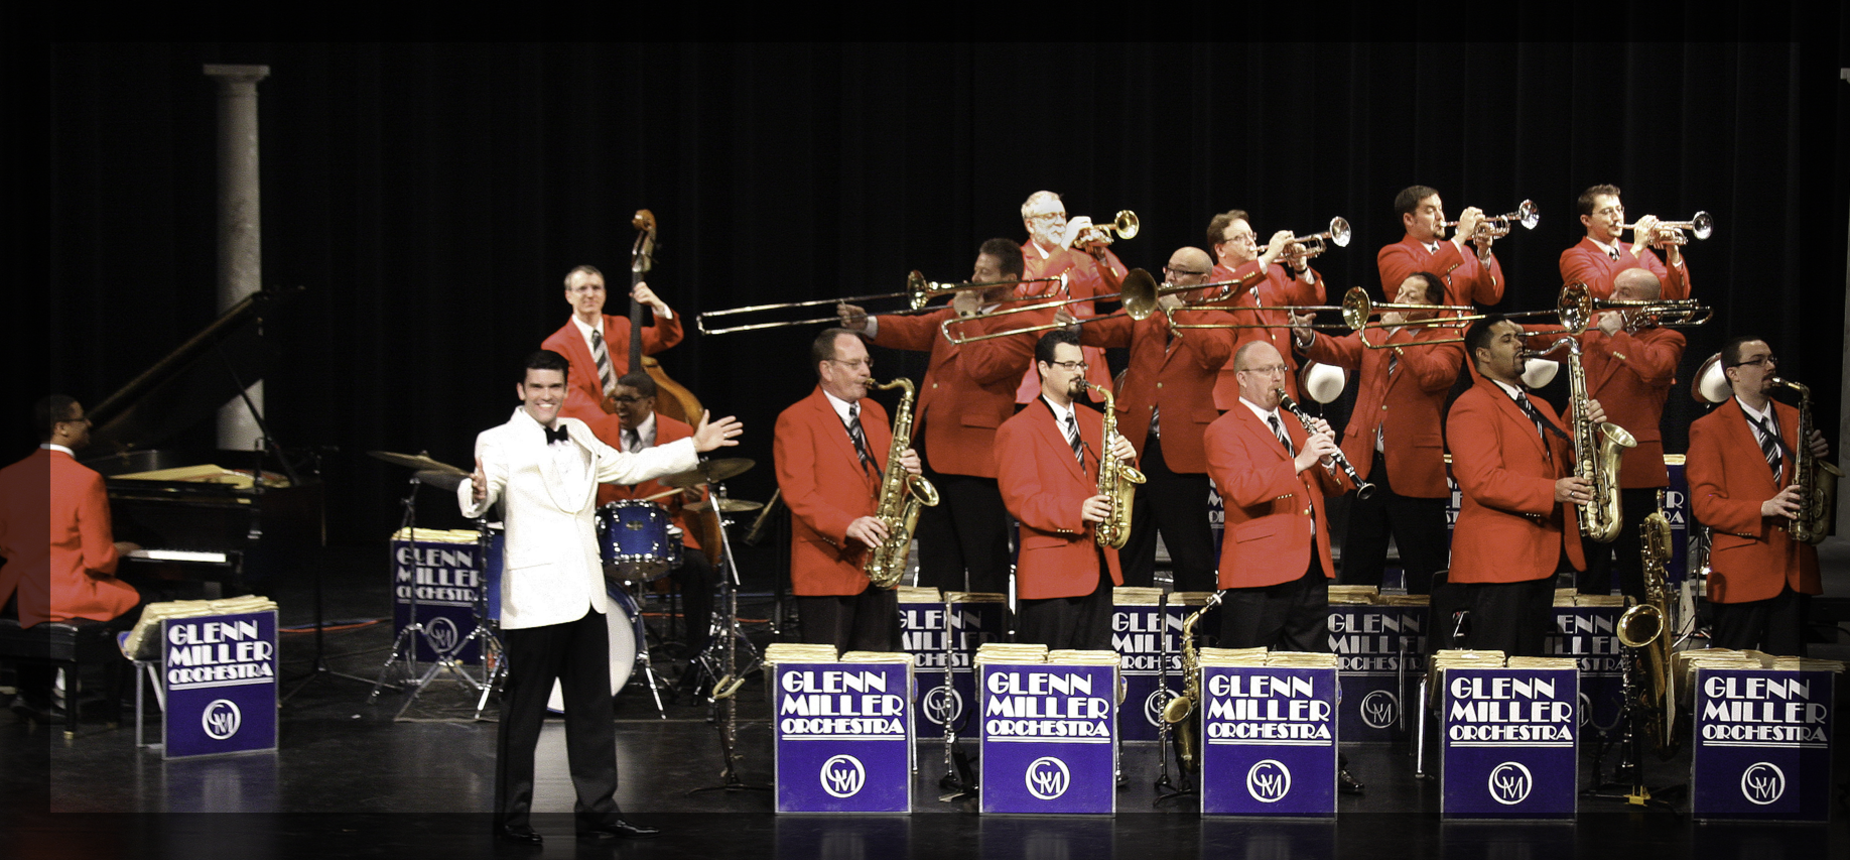 Photo of the Glenn Miller Orchestra